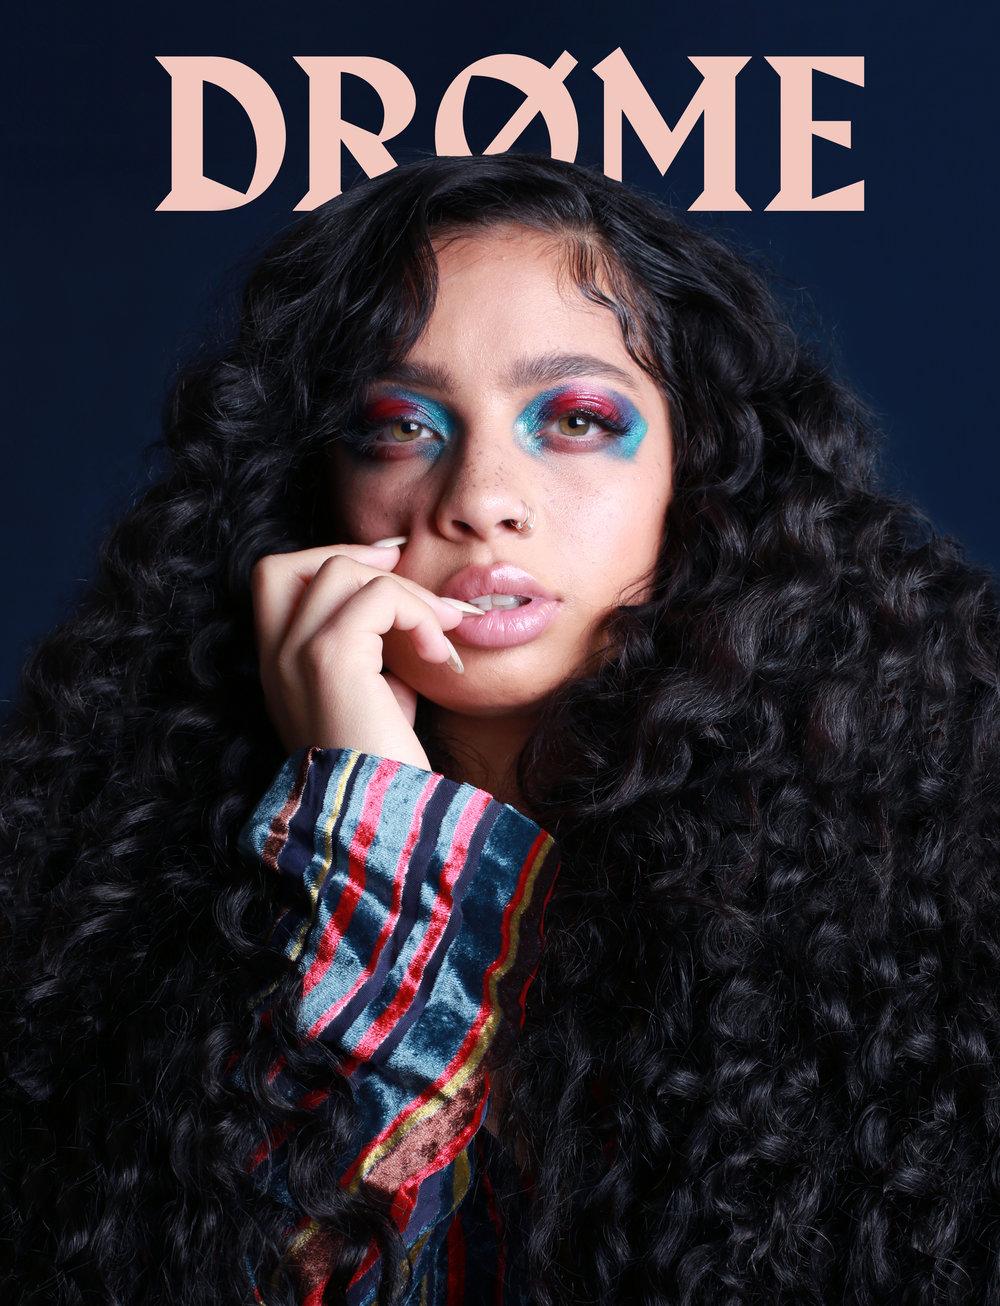 DROME_COVER_180404_B.jpg